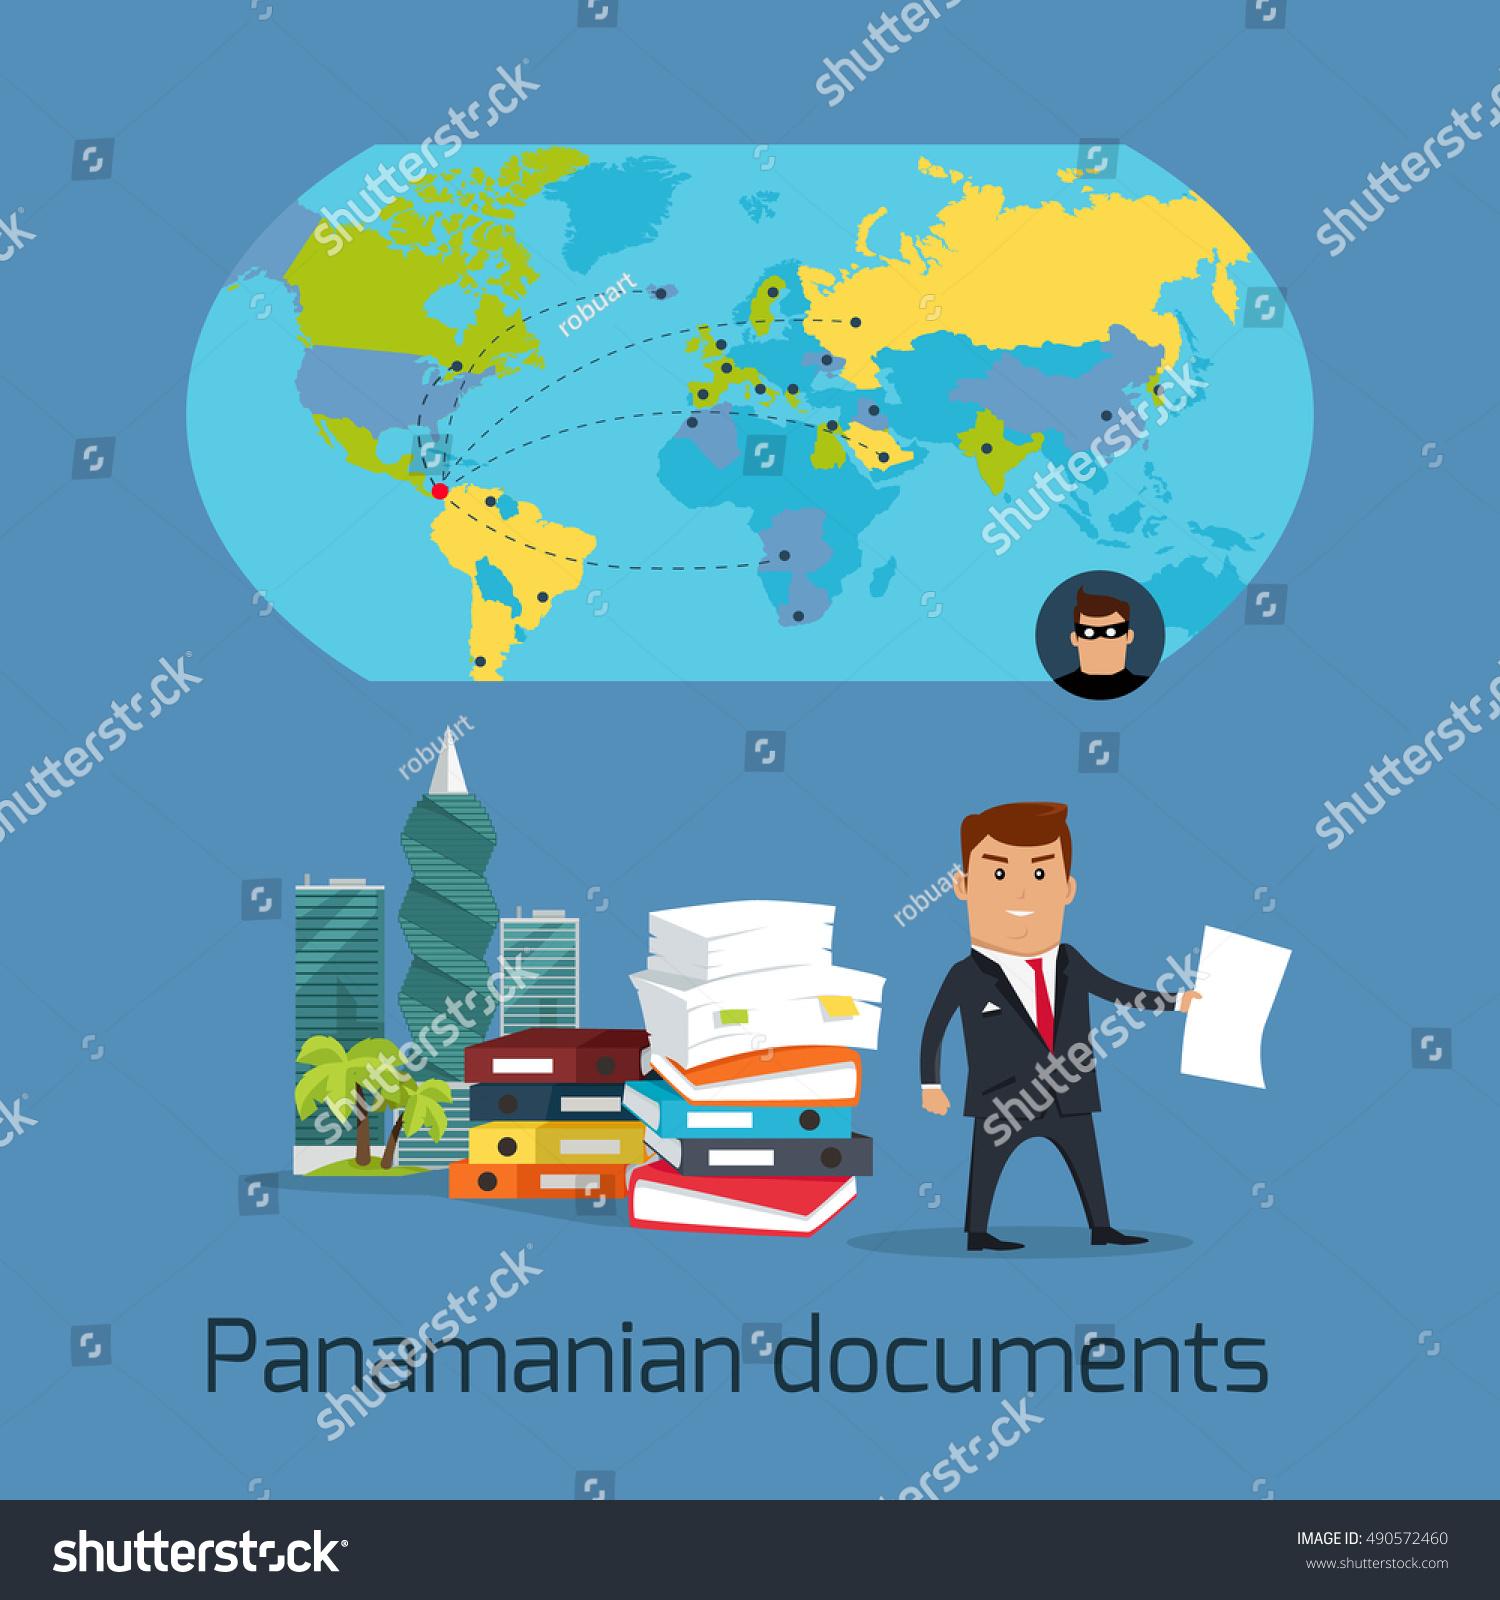 Panamanian documents concept vector flat design stock vector panamanian documents concept vector flat design financial fraud tax evasion money laundering buycottarizona Images